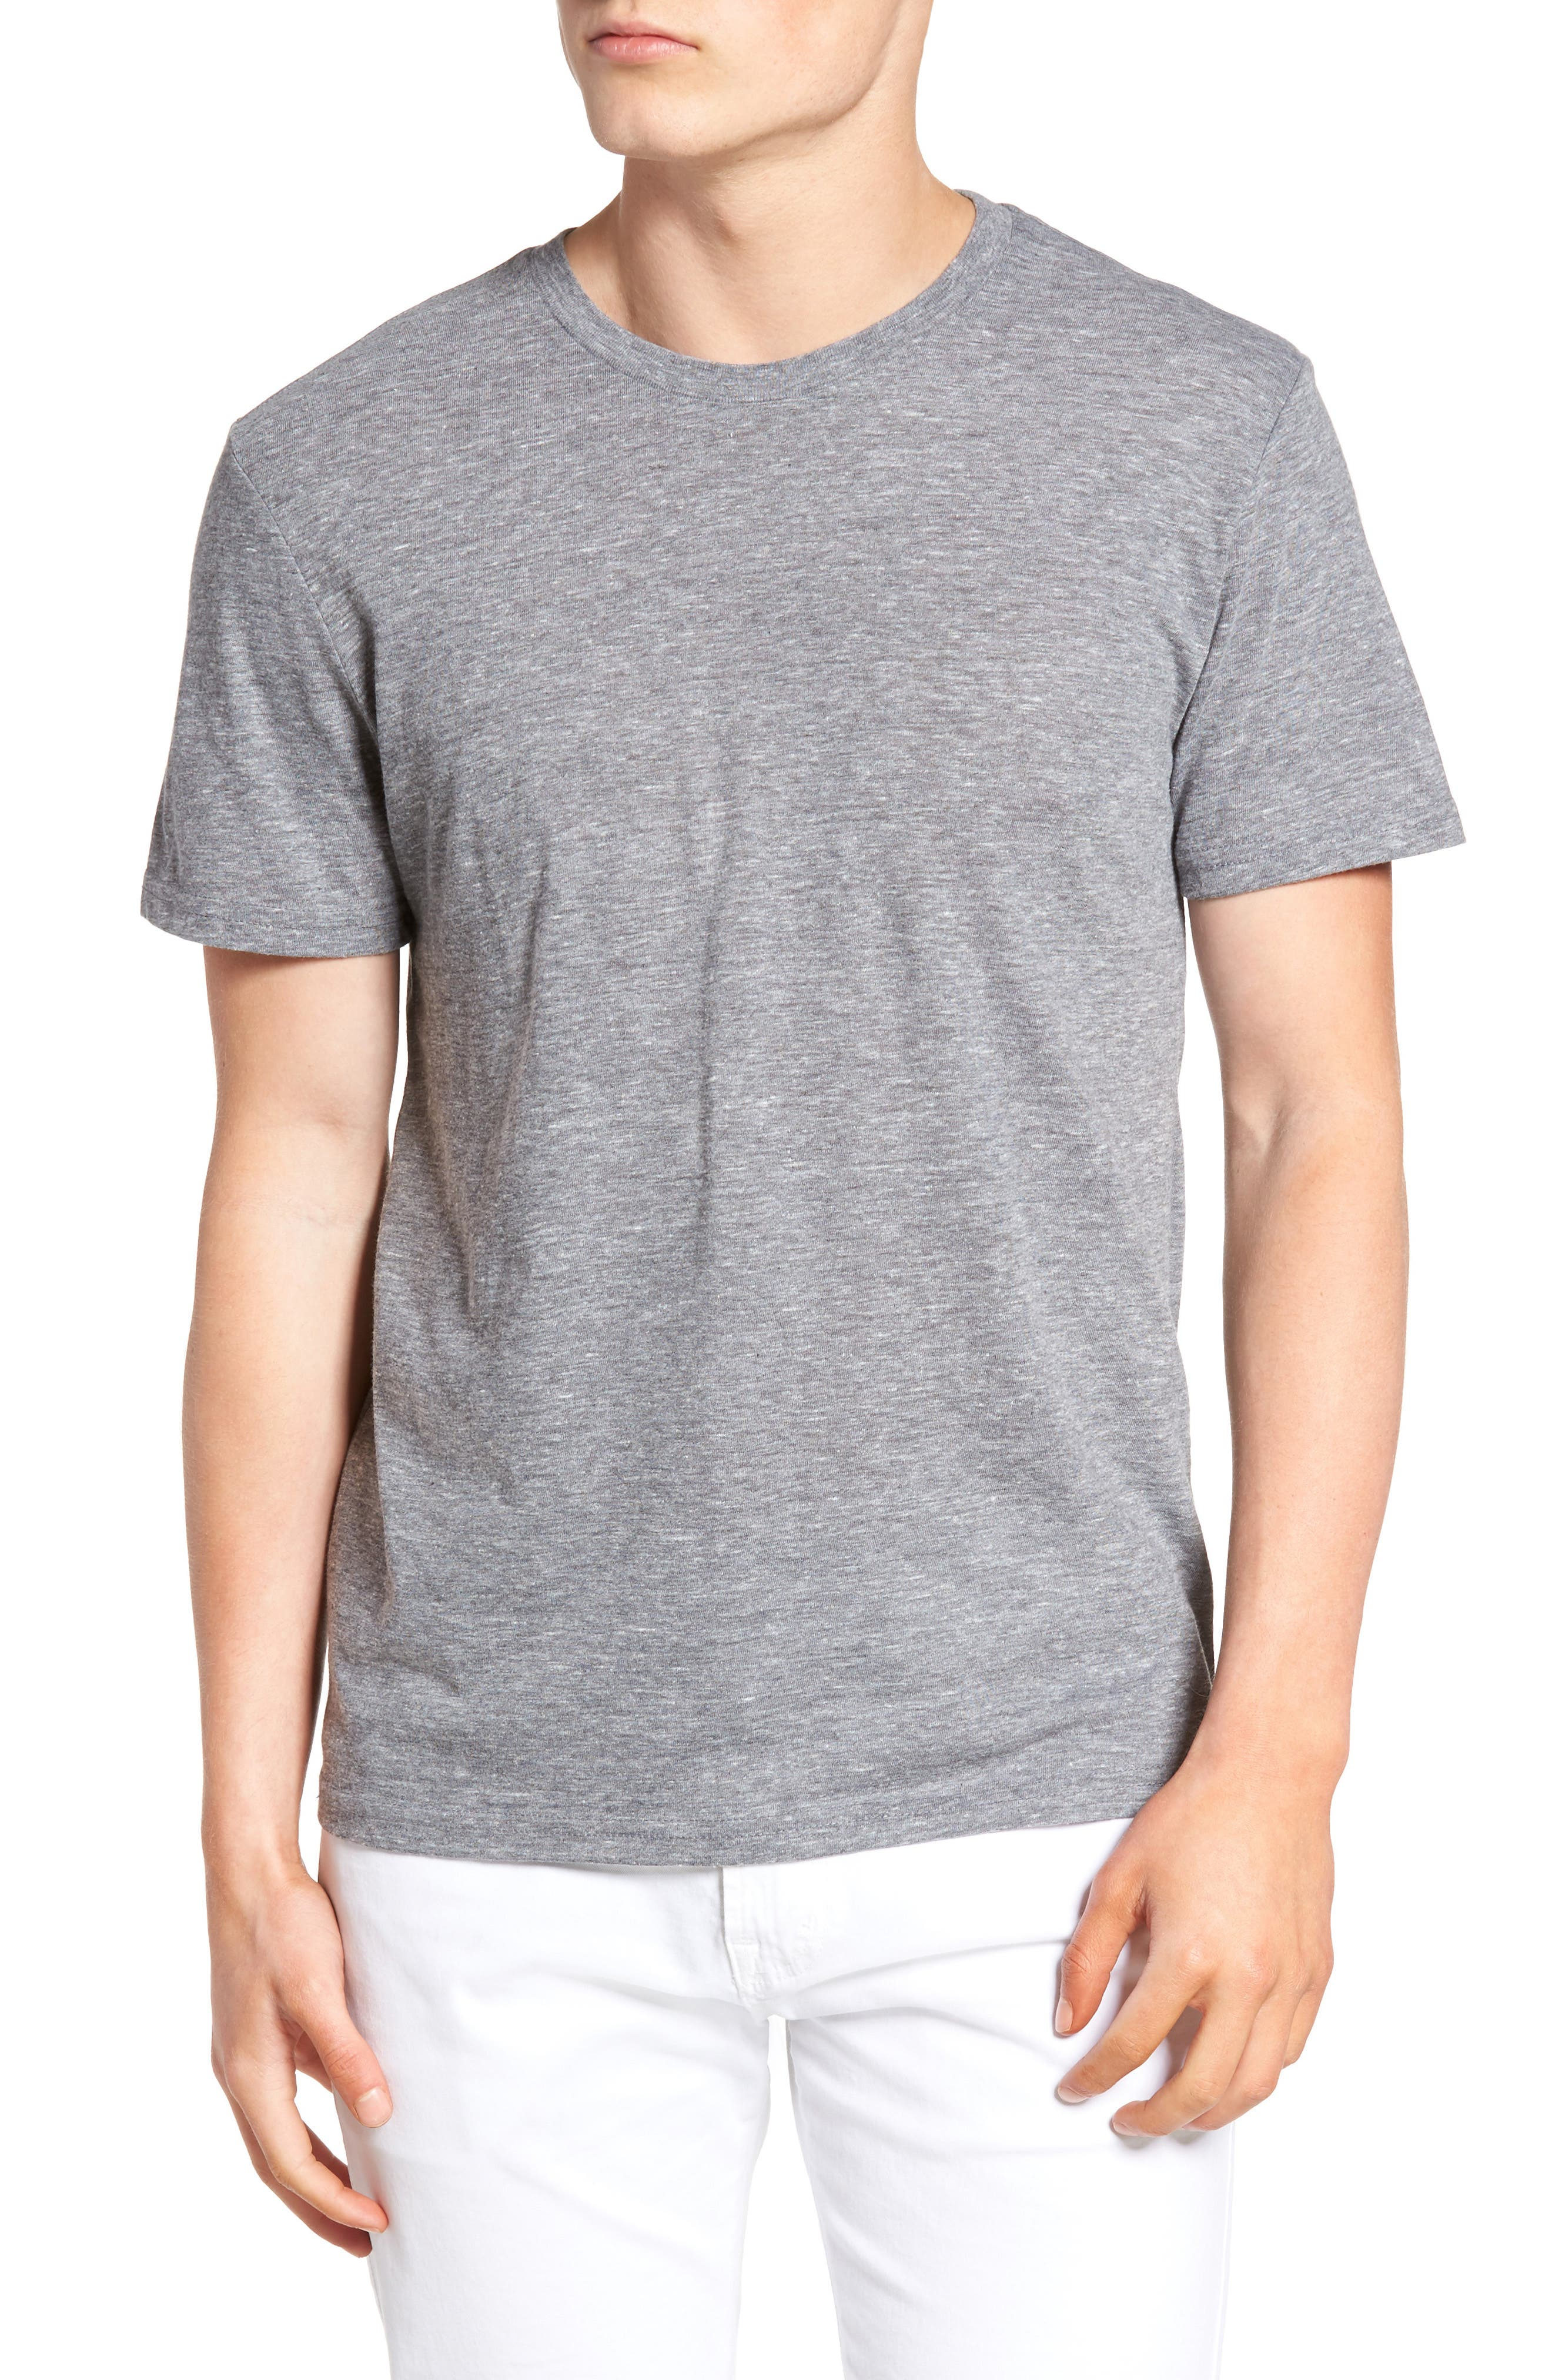 Main Image - The Rail Slim Fit Crewneck T-Shirt